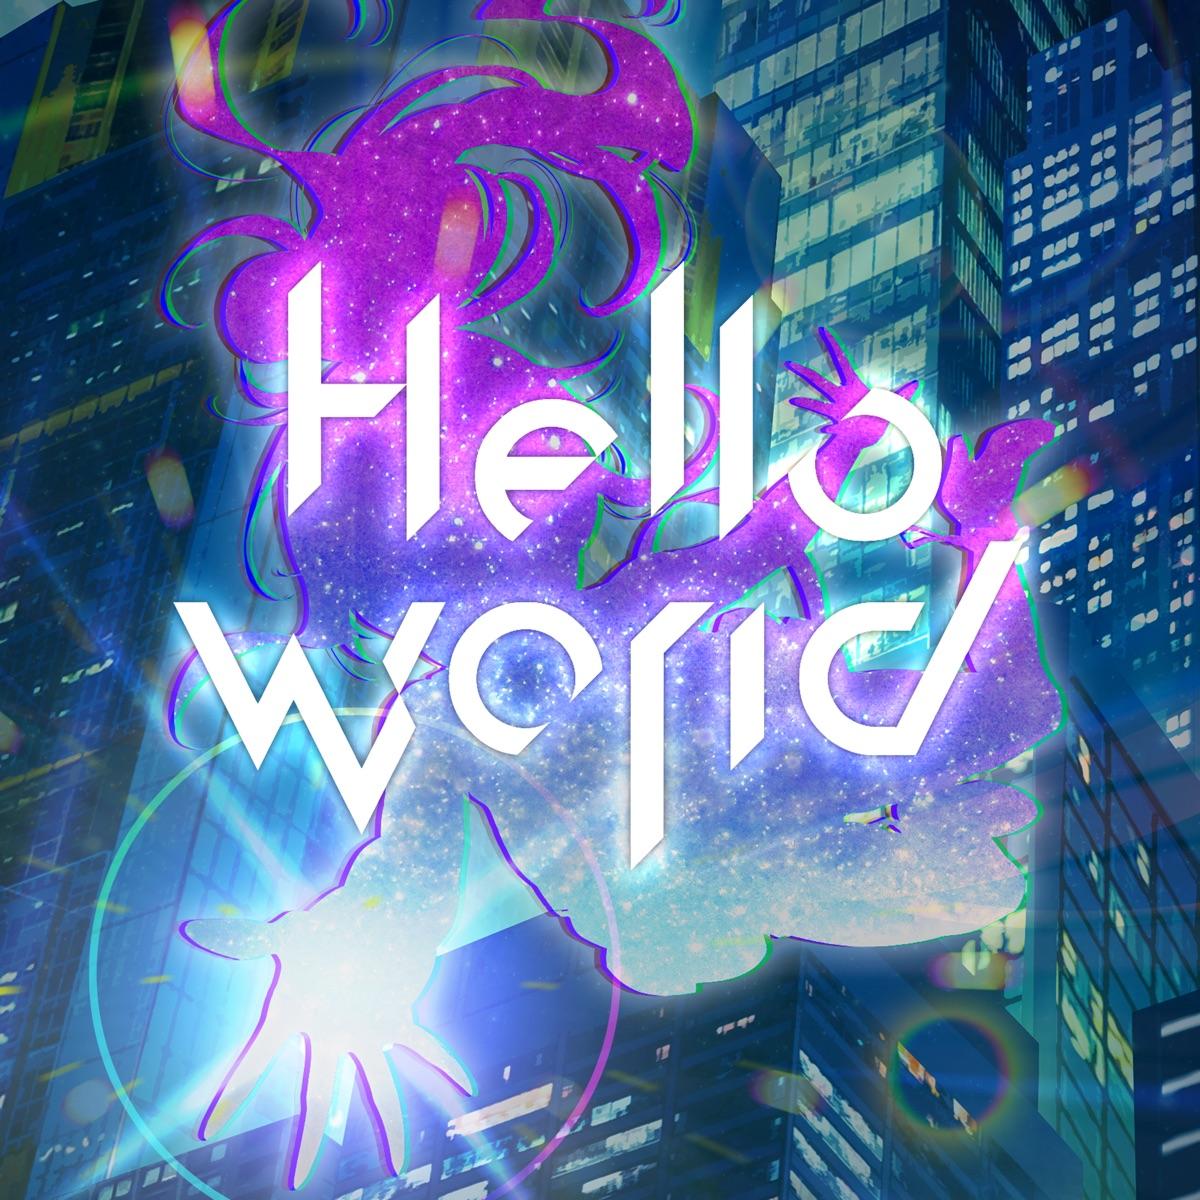 『Kizuna AI (キズナアイ) - Hello World』収録の『Hello World』ジャケット